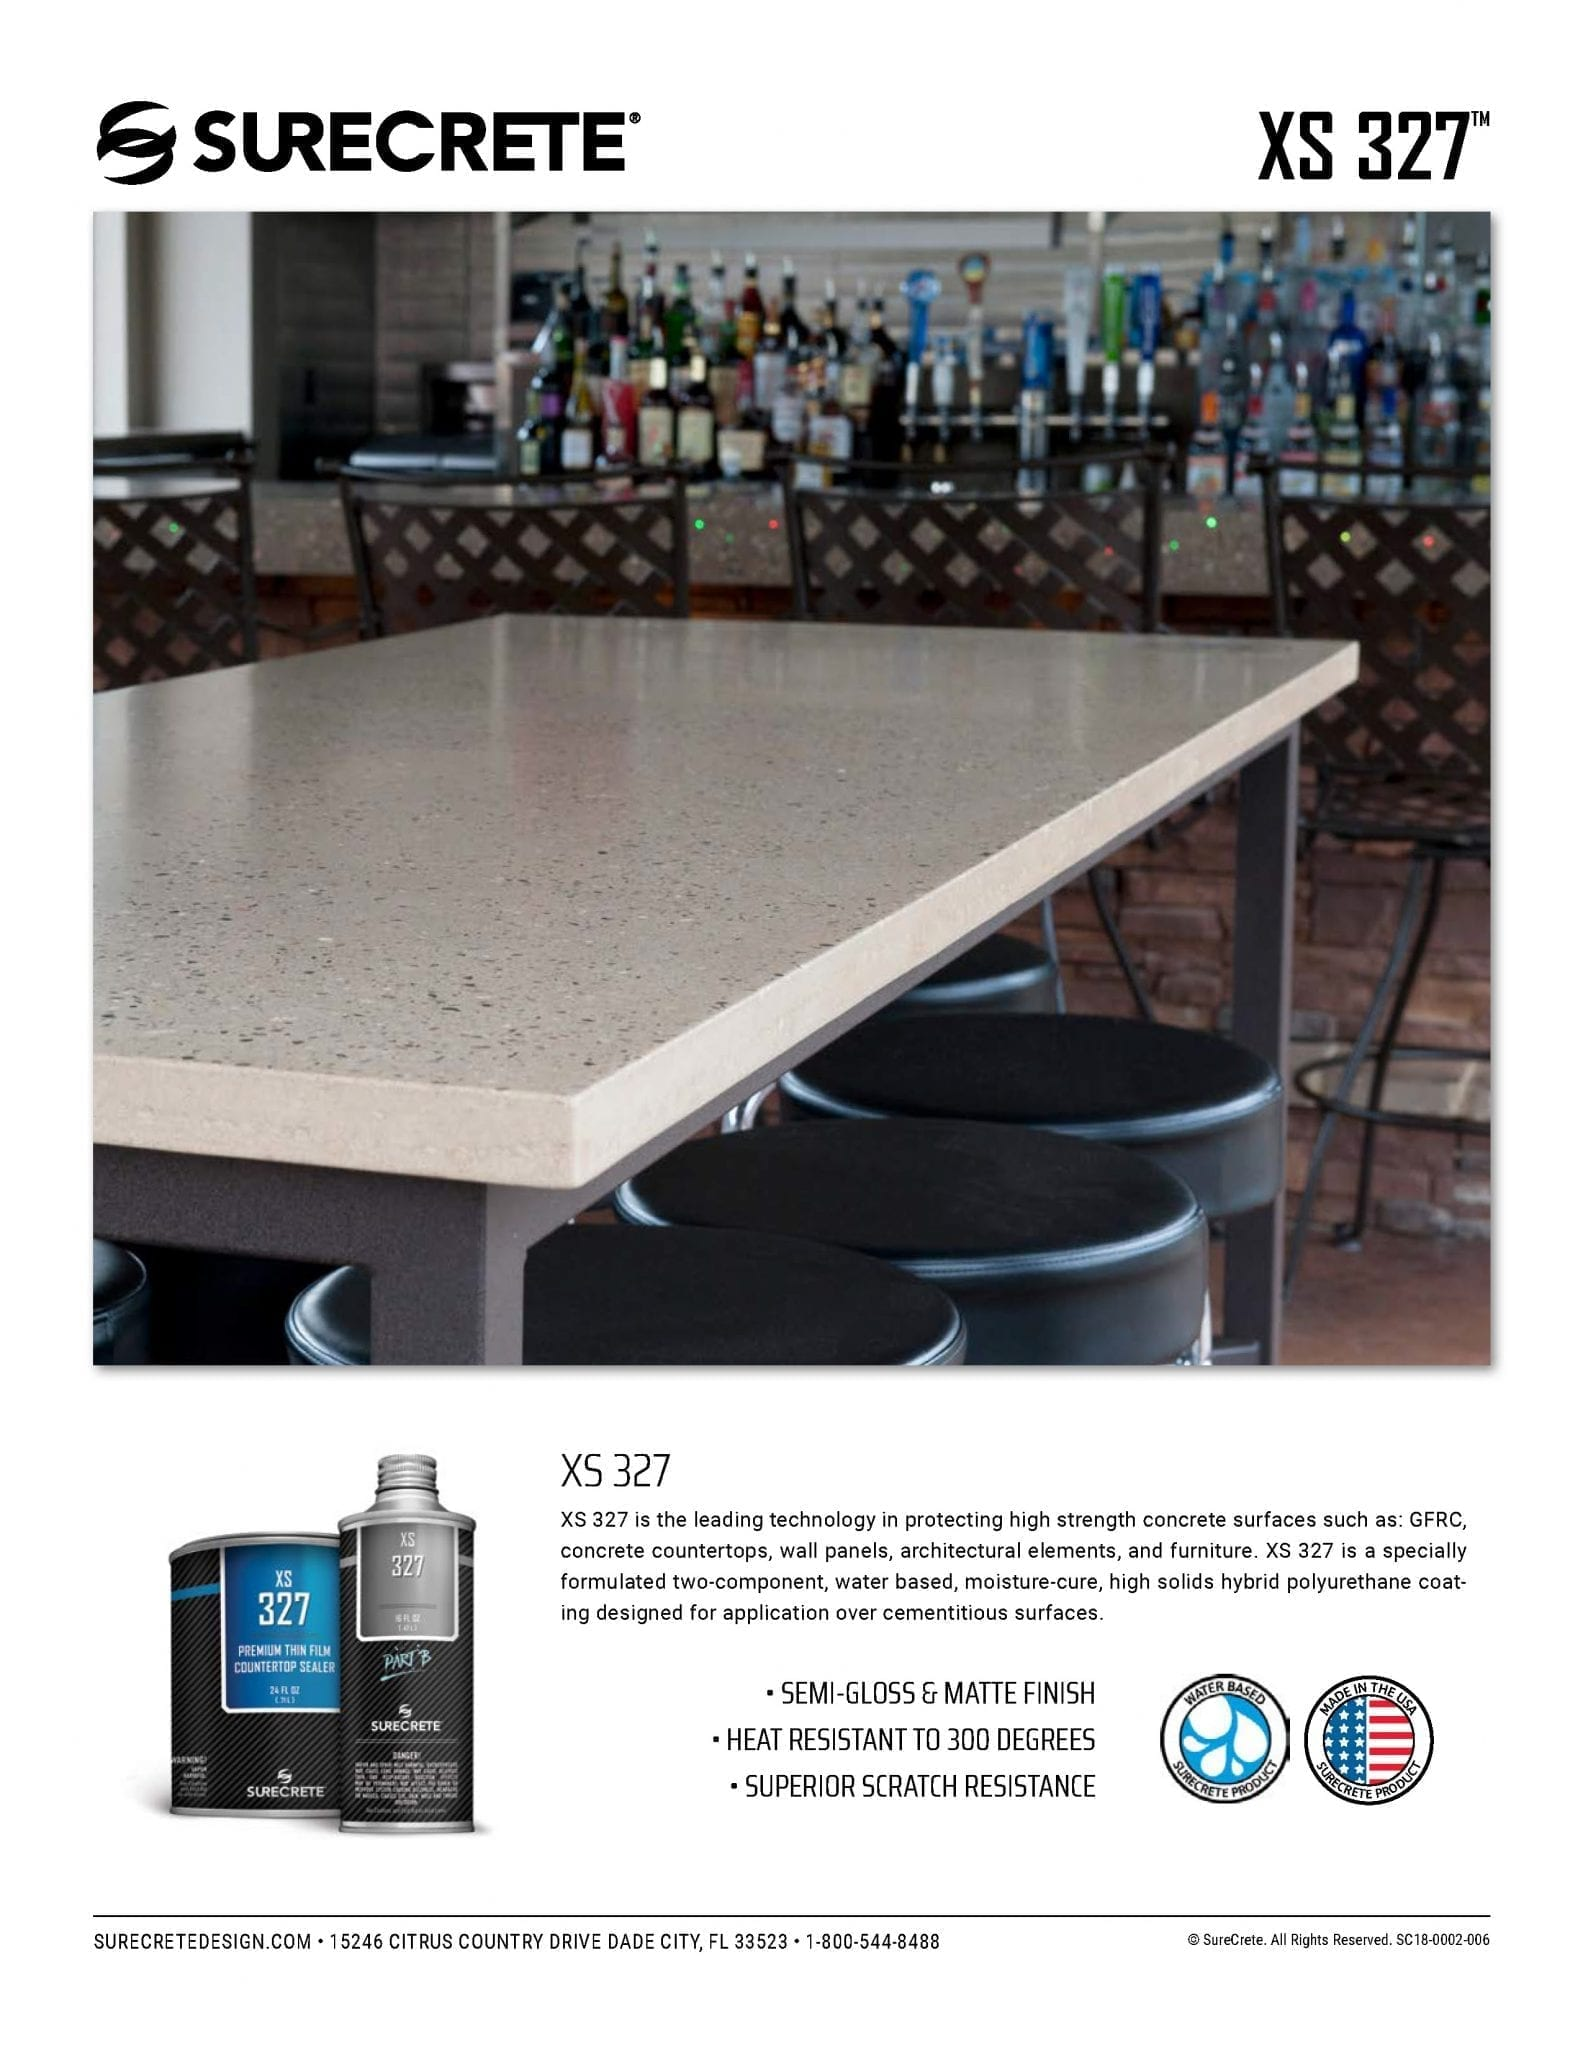 Concrete Countertop Sealer Food Safe Coating Gloss or Matte XS 9™